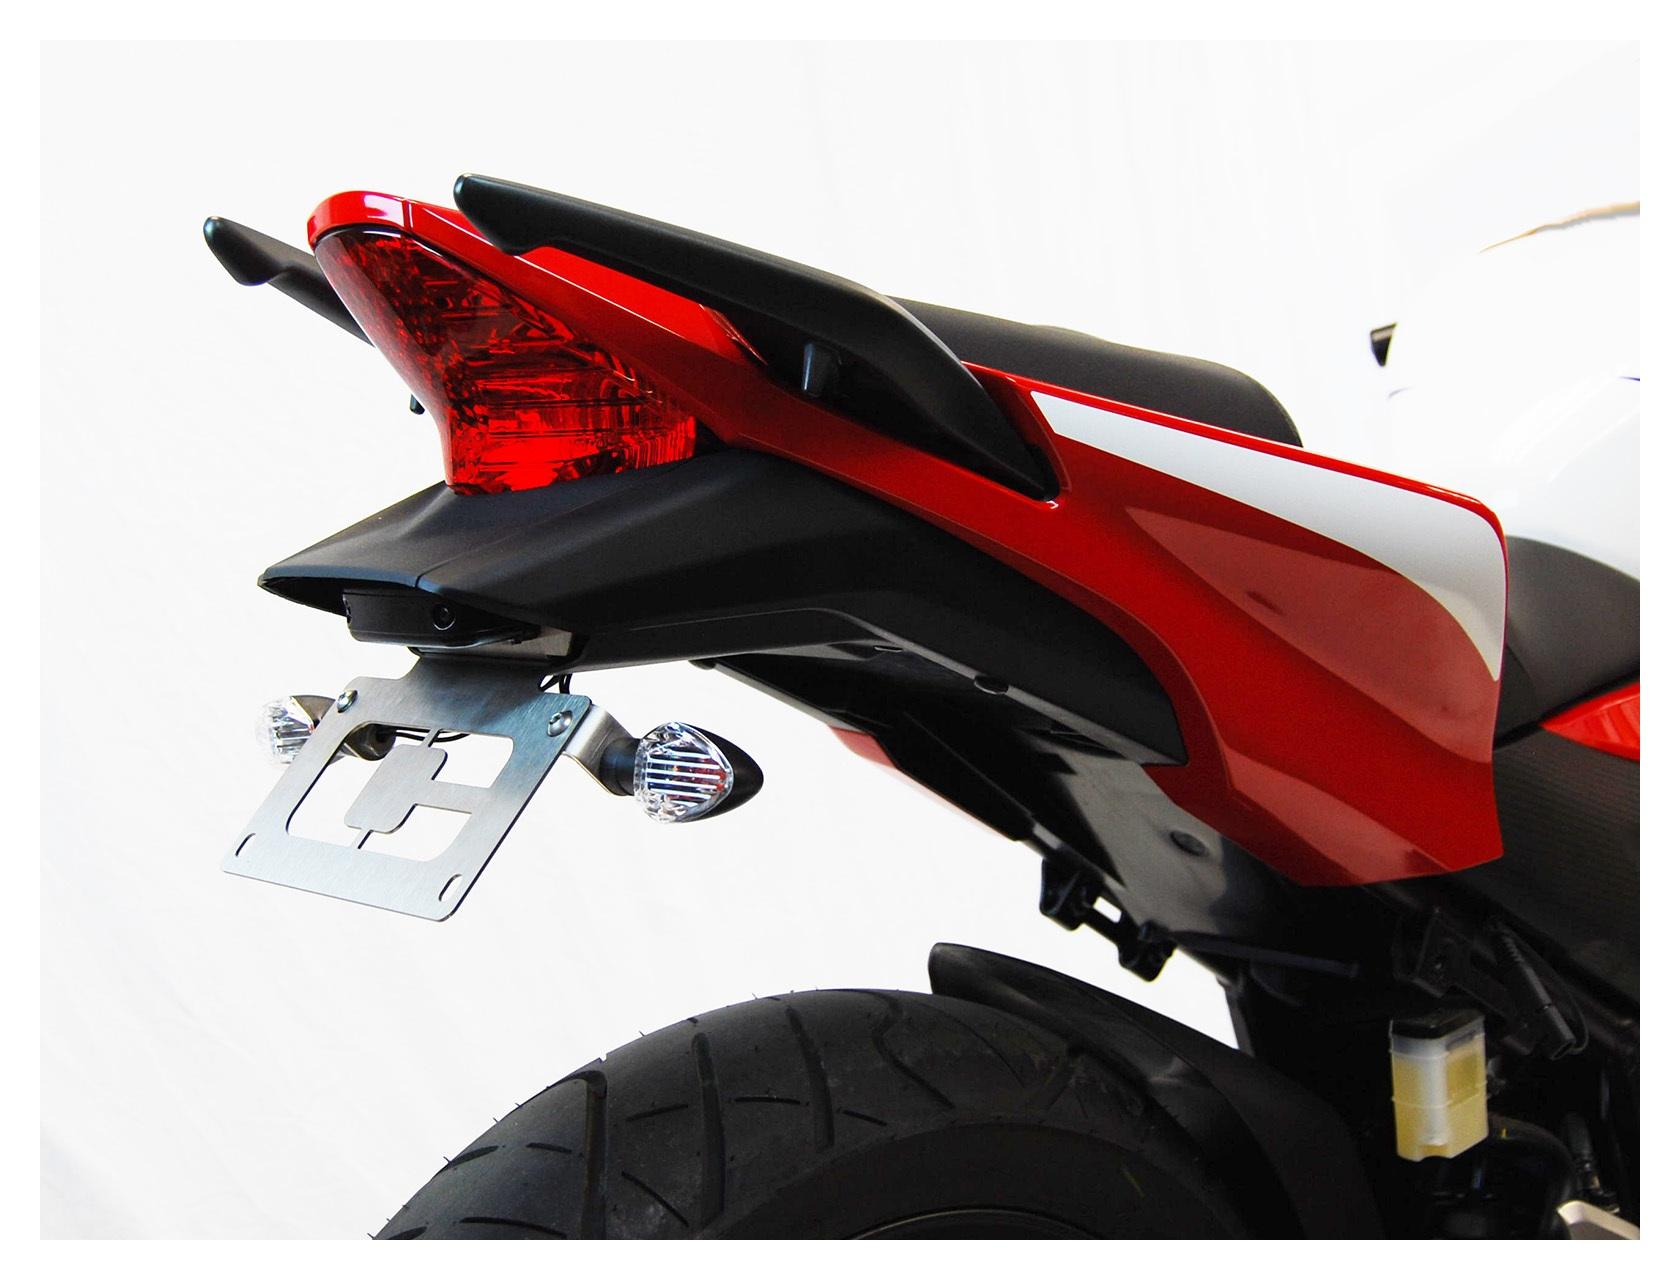 Competition Werkes Fender Eliminator Kit Honda Cbr300r Cb300f 2015 2019 10 1149 Off Ducati 848 Evo Fuse Box Location Revzilla